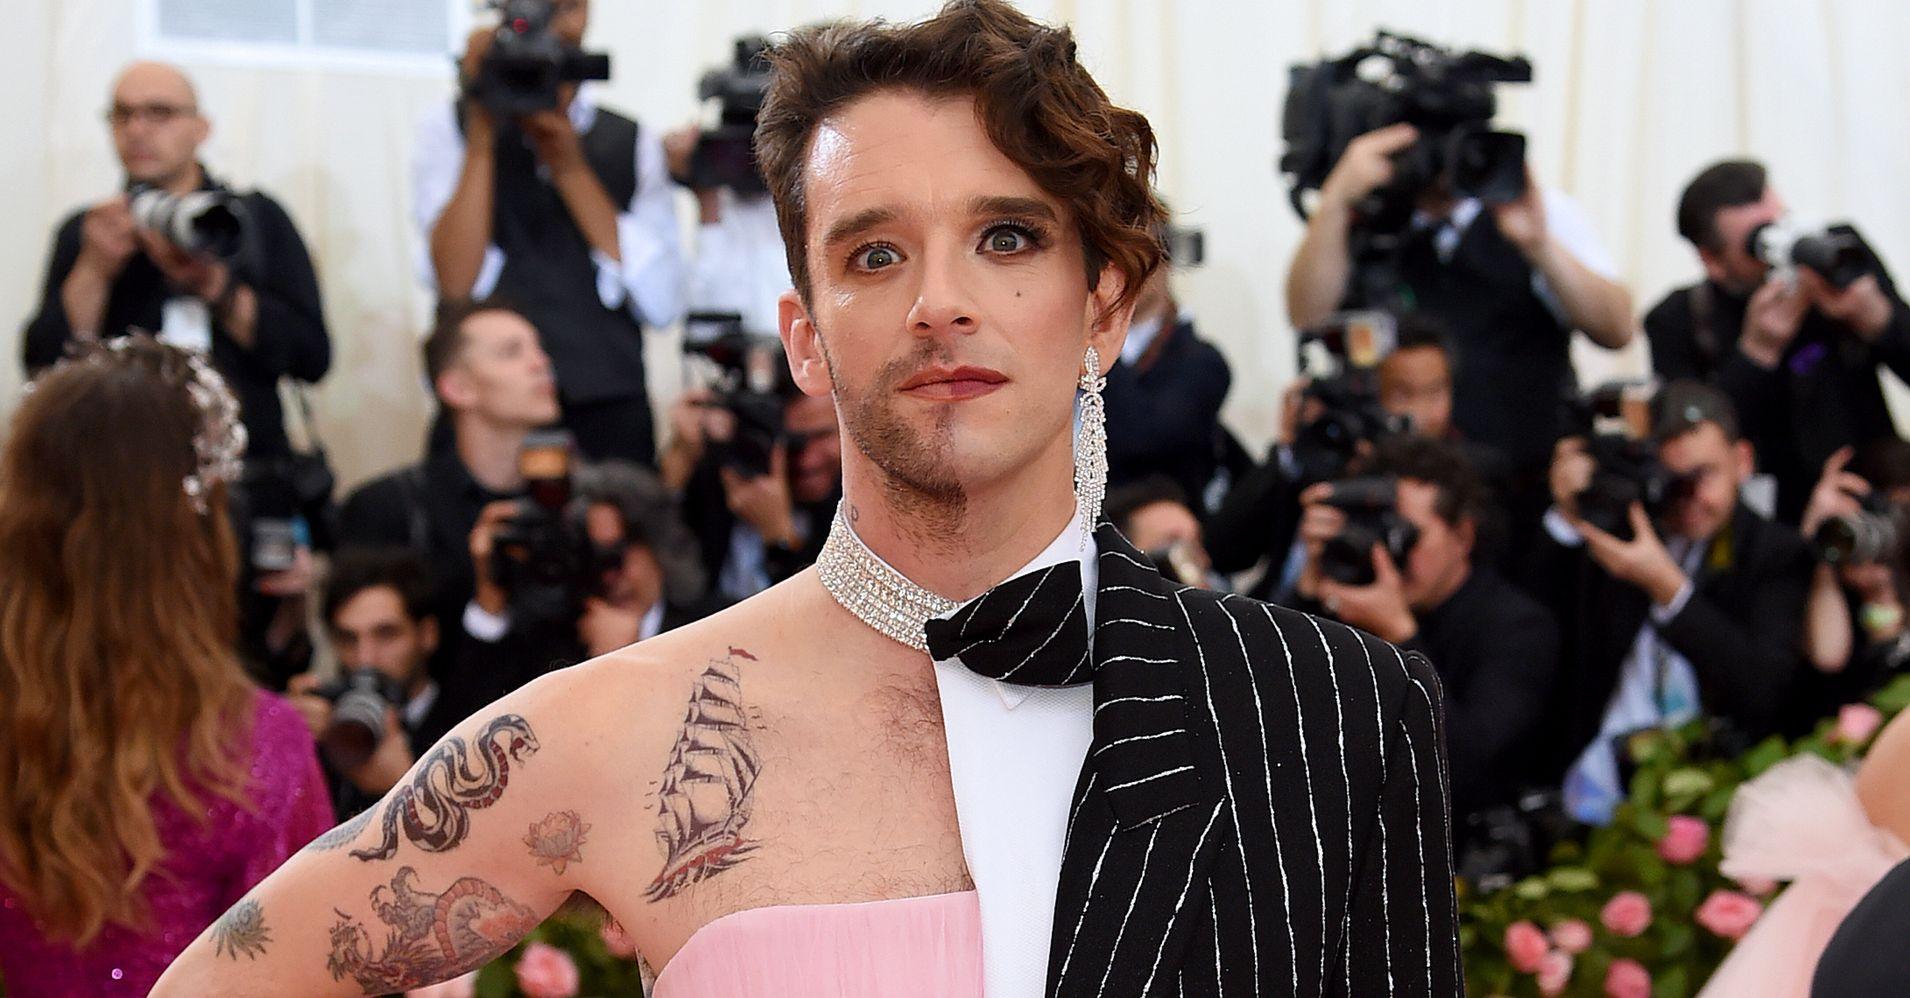 16e1b52b20f5 Michael Urie's 2019 Met Gala Look Was A Gender-Bending Sensation | HuffPost  Life